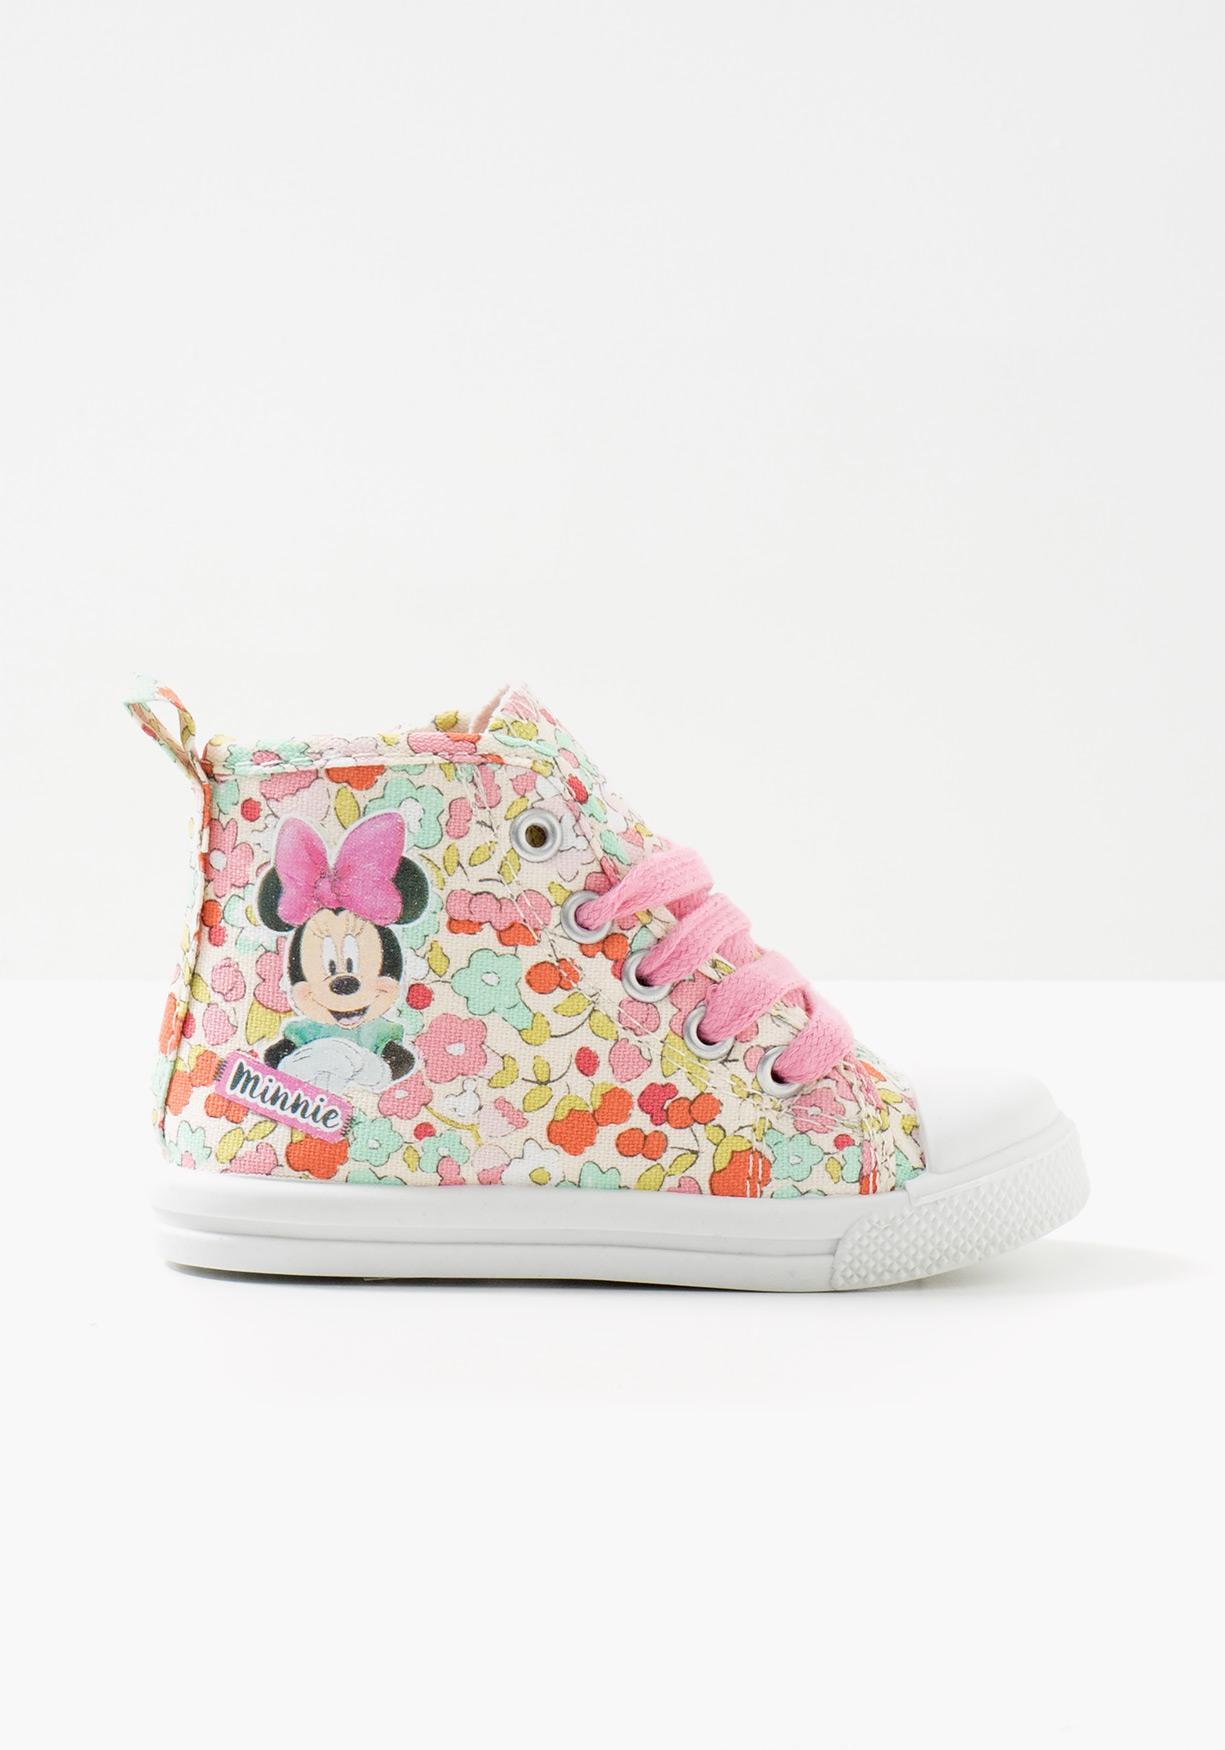 e0454c0a1 Comprar Zapatillas de lona Minnie de DISNEY (Tallas 20 a 30 ...